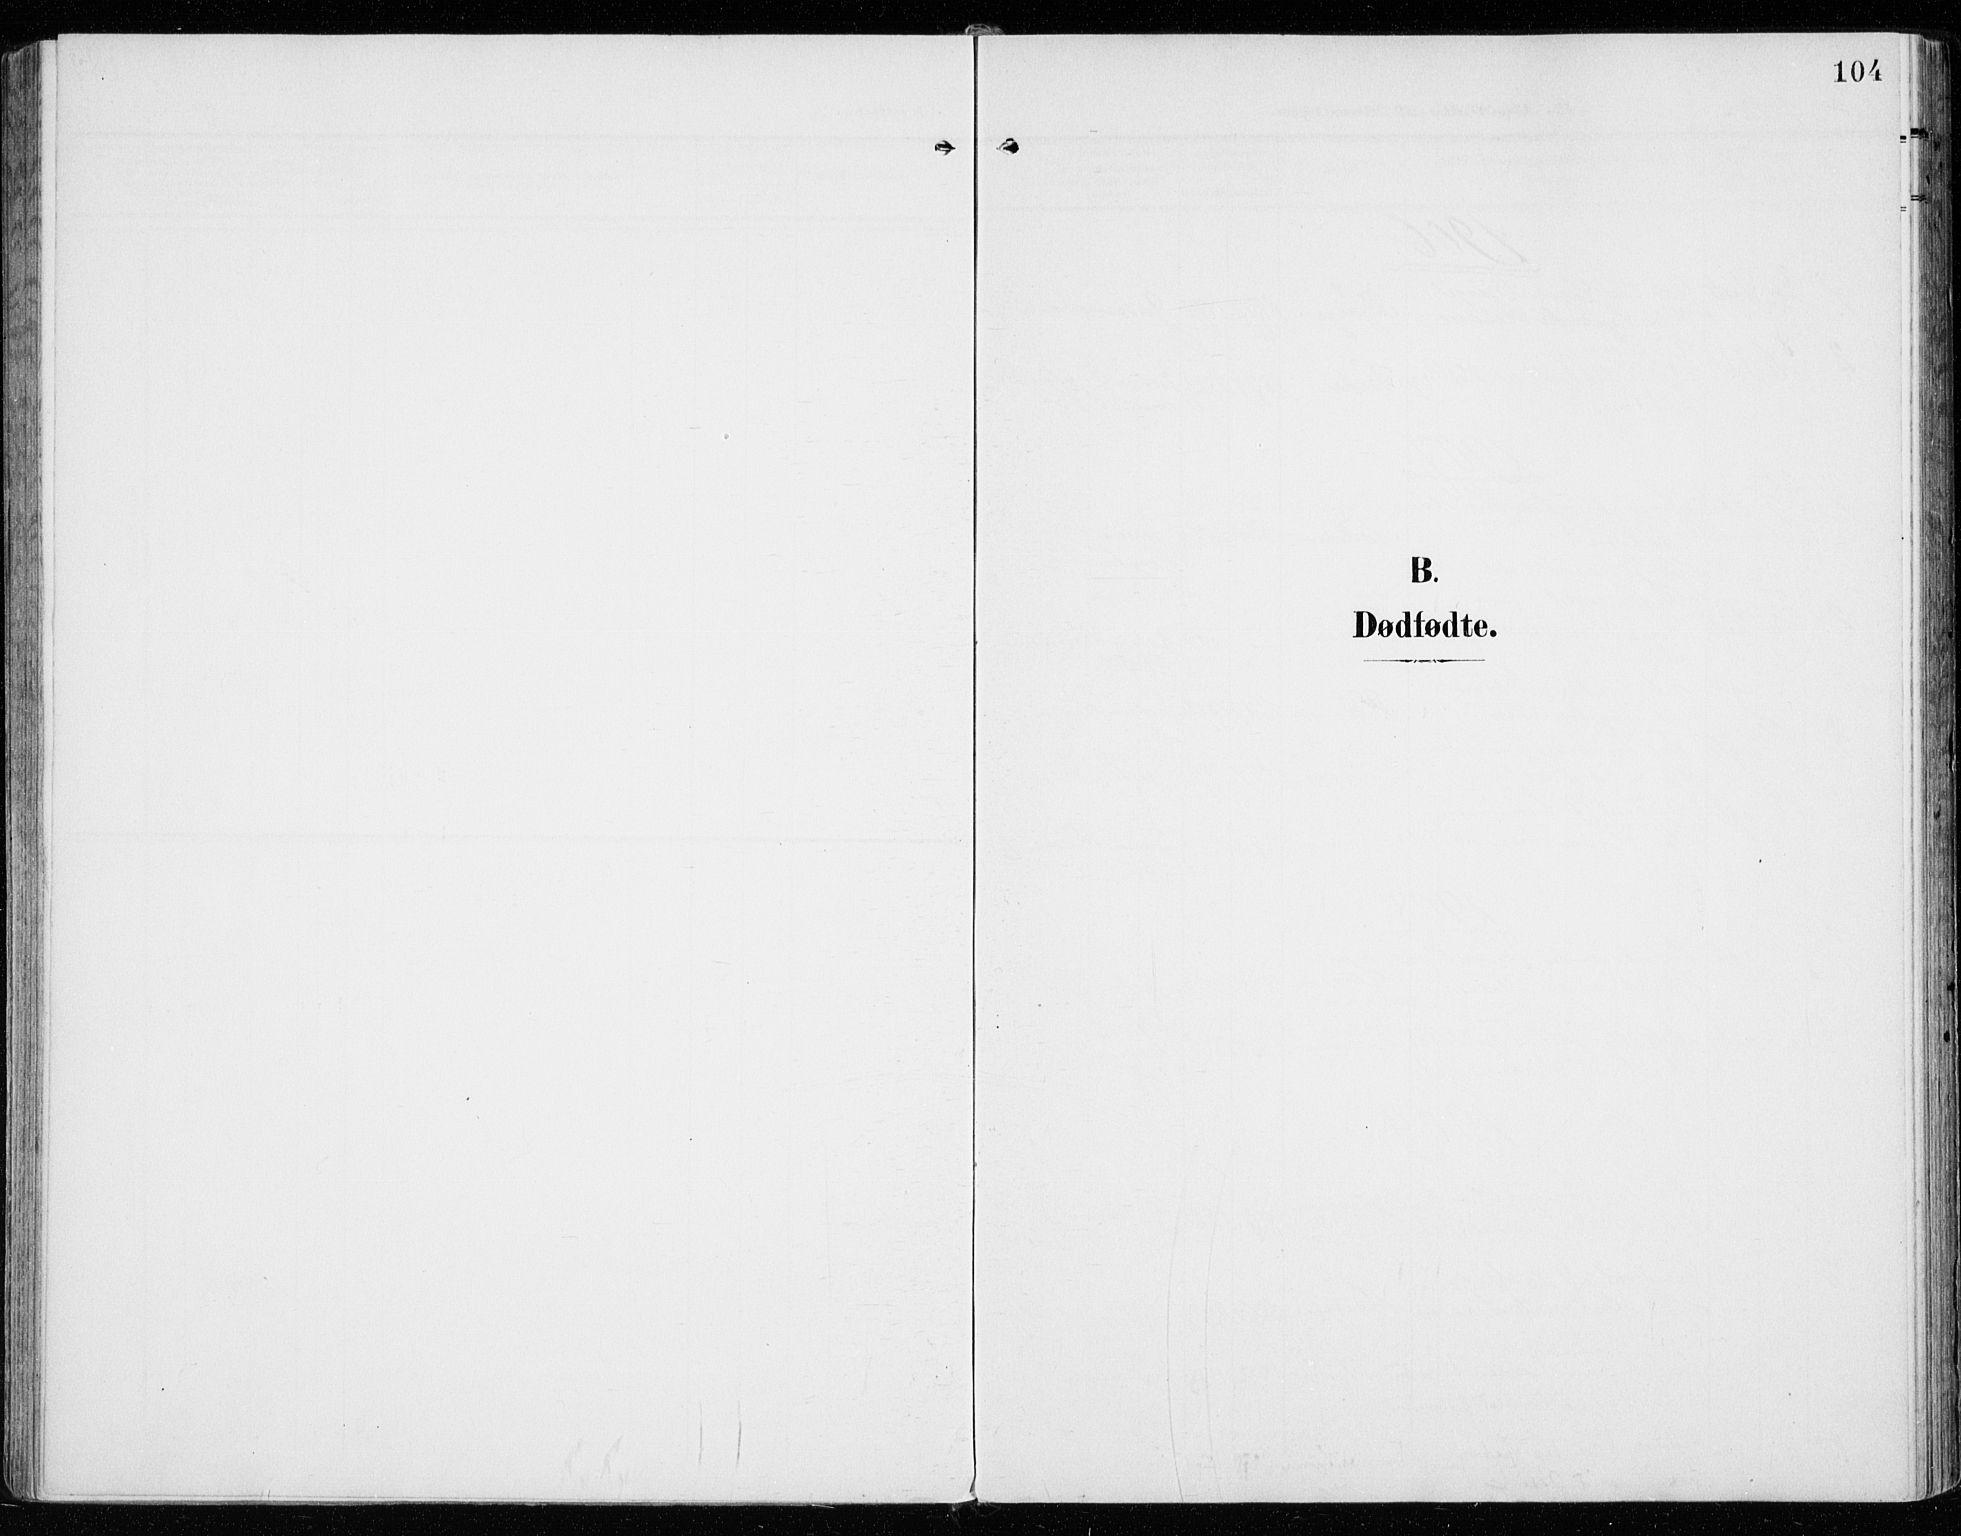 SAH, Vardal prestekontor, H/Ha/Haa/L0016: Ministerialbok nr. 16, 1904-1916, s. 104